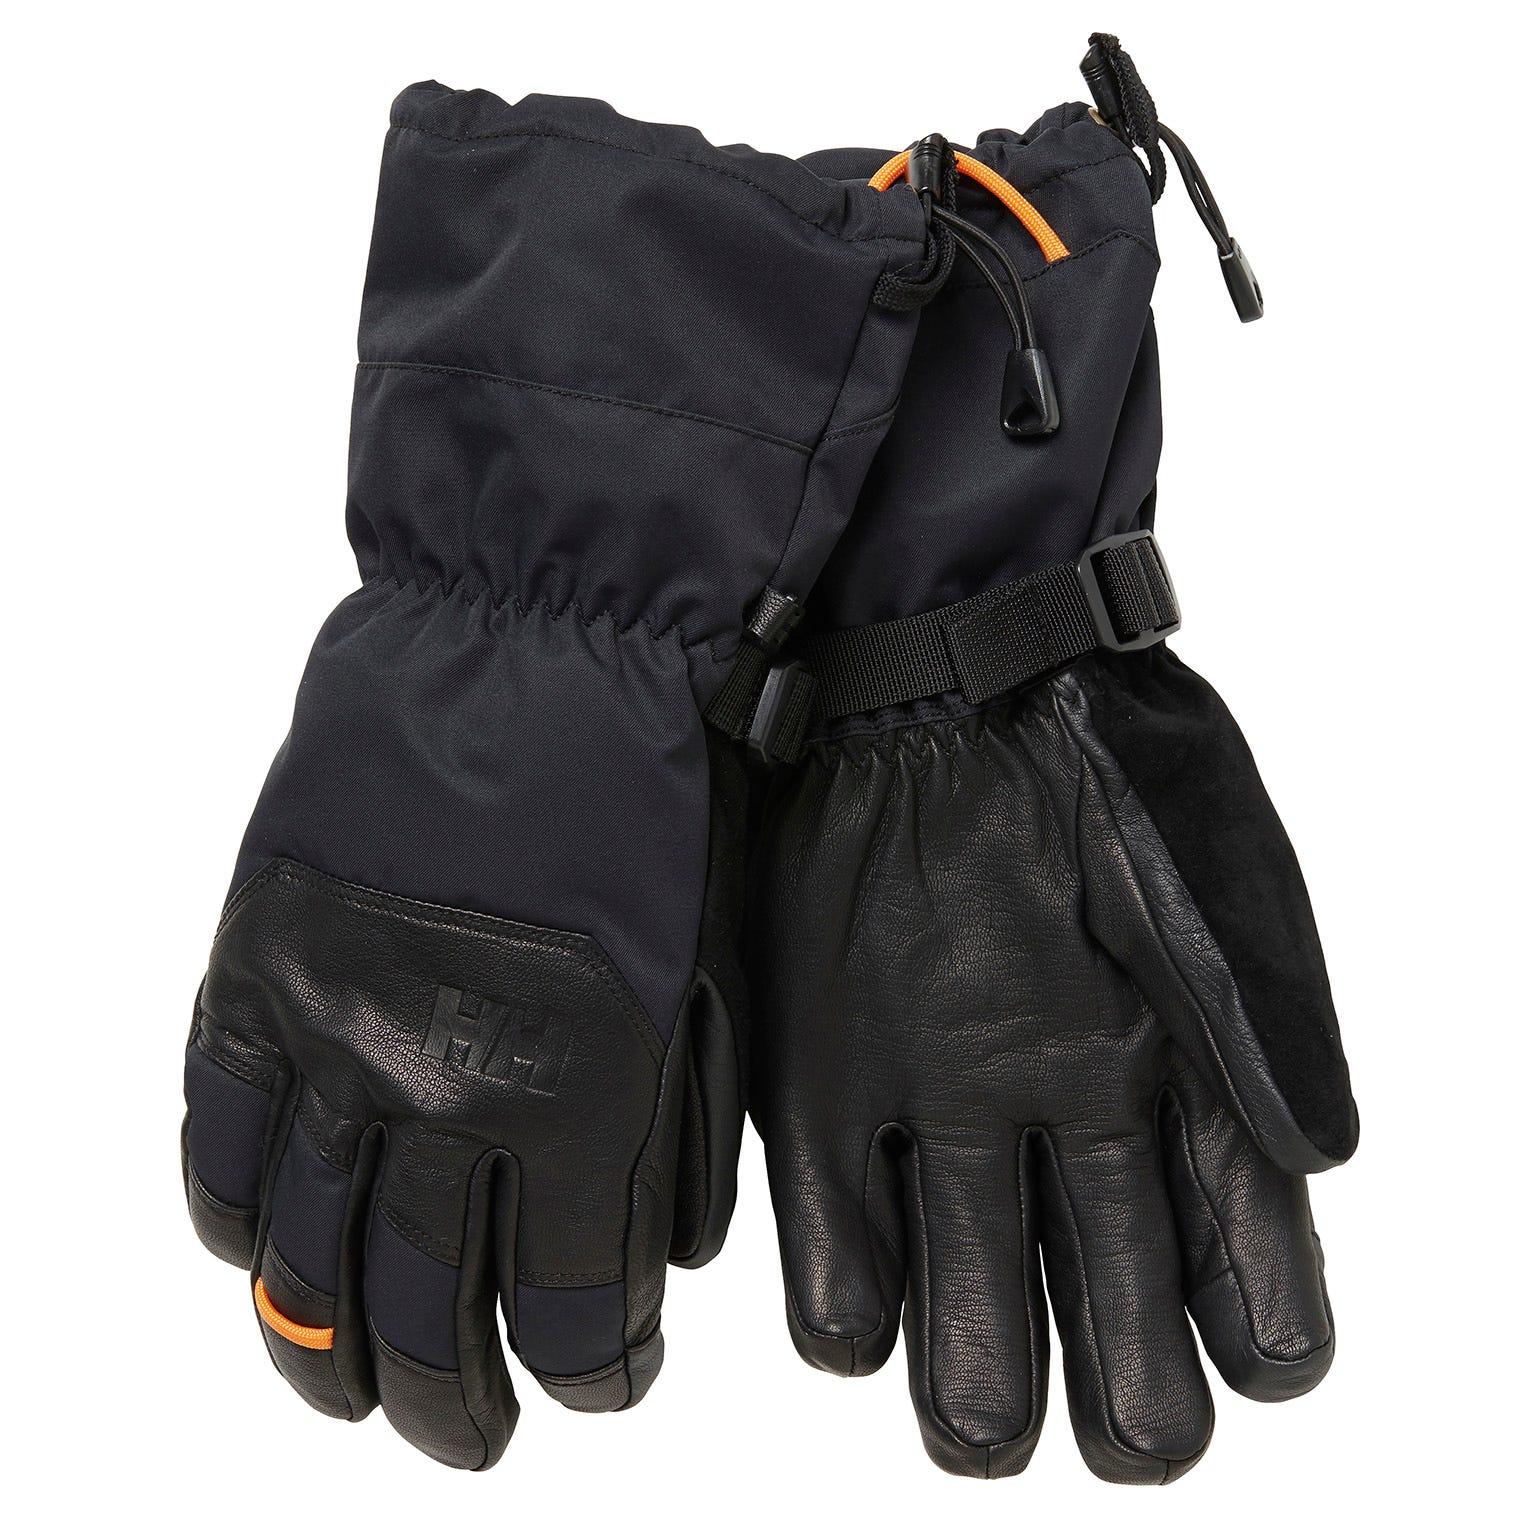 Helly Hansen Ullr Sogn Ht Glove Mens Black S